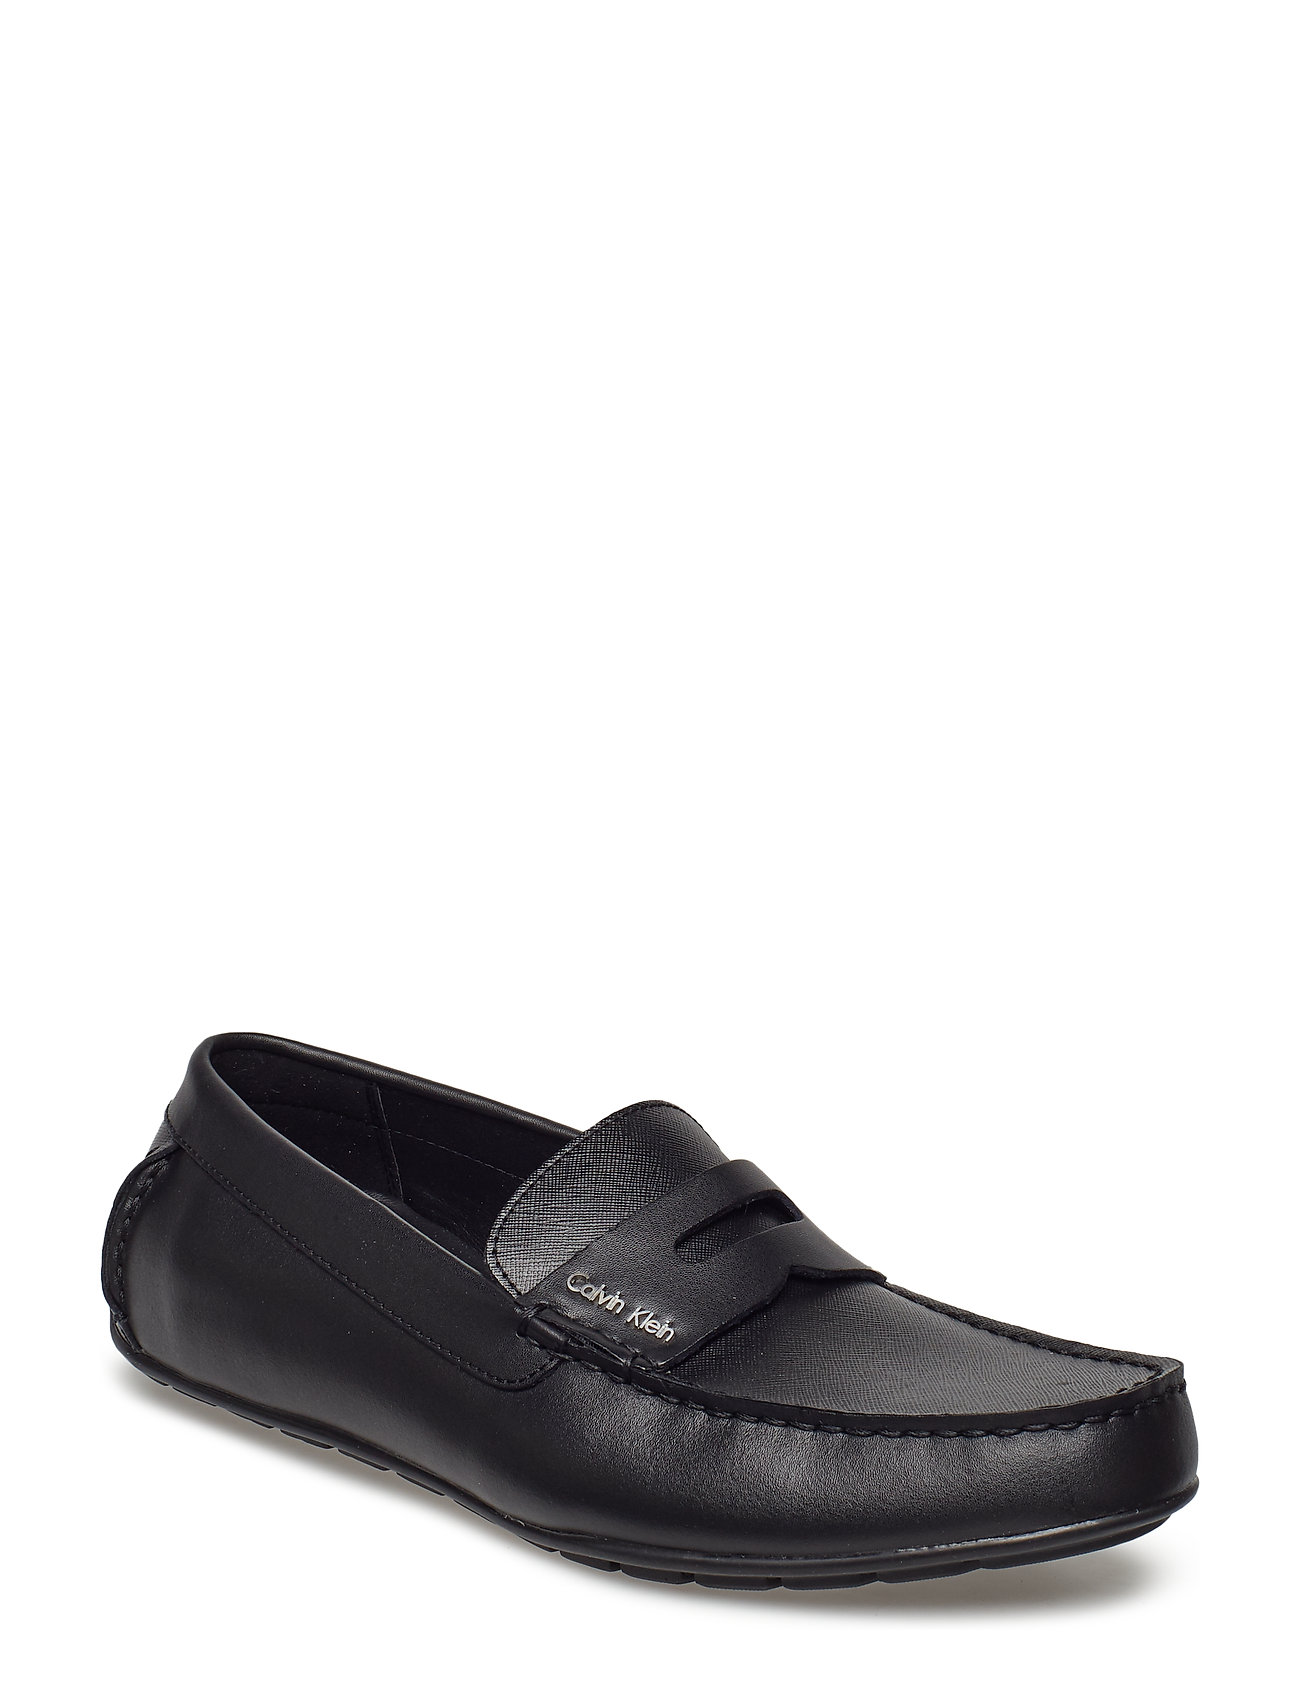 CALVIN KLEIN Ivan Brushed Leather/Saffiano Shoes Business Loafers Schwarz CALVIN KLEIN